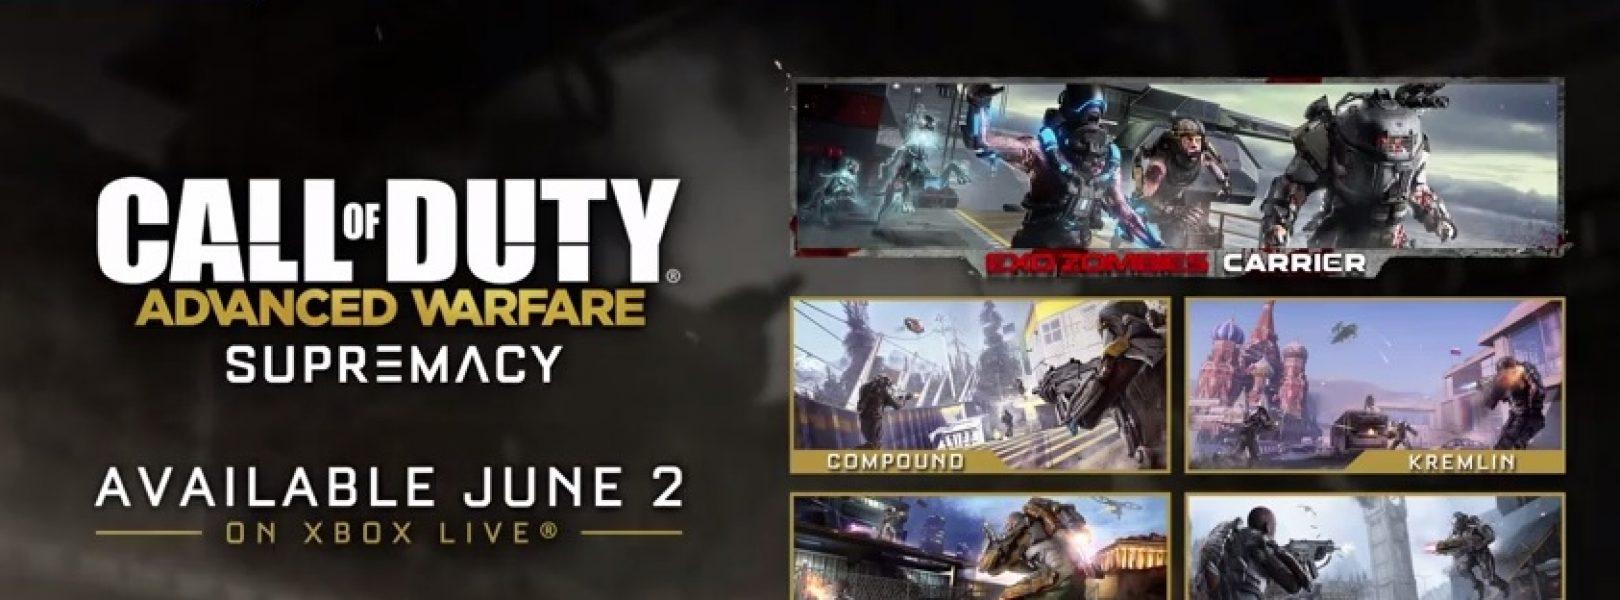 Call Of Duty Advanced Warfare Capsule Computers